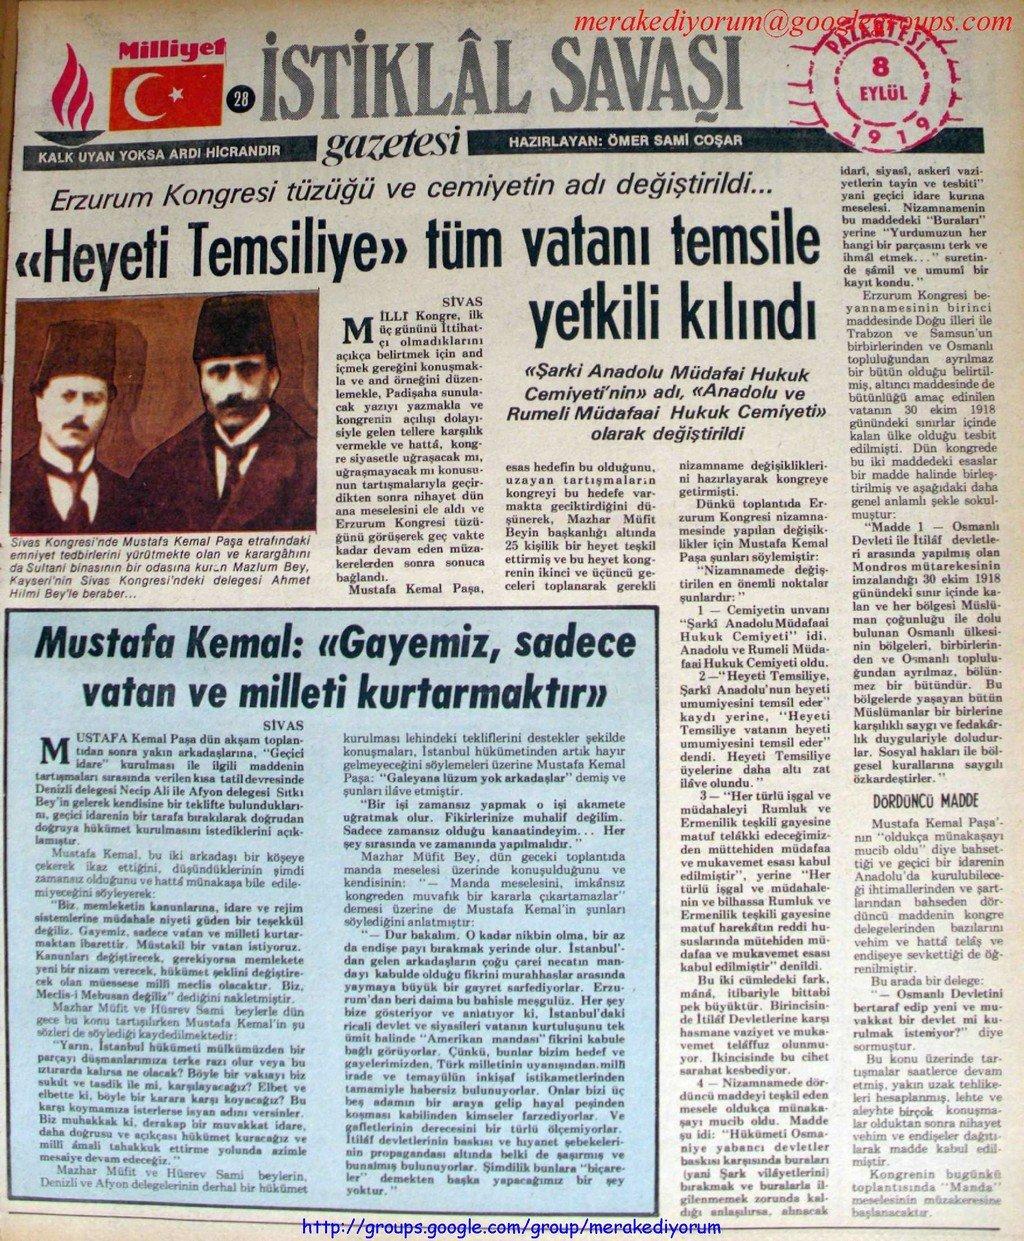 istiklal savaşı gazetesi - 6 eylül 1919